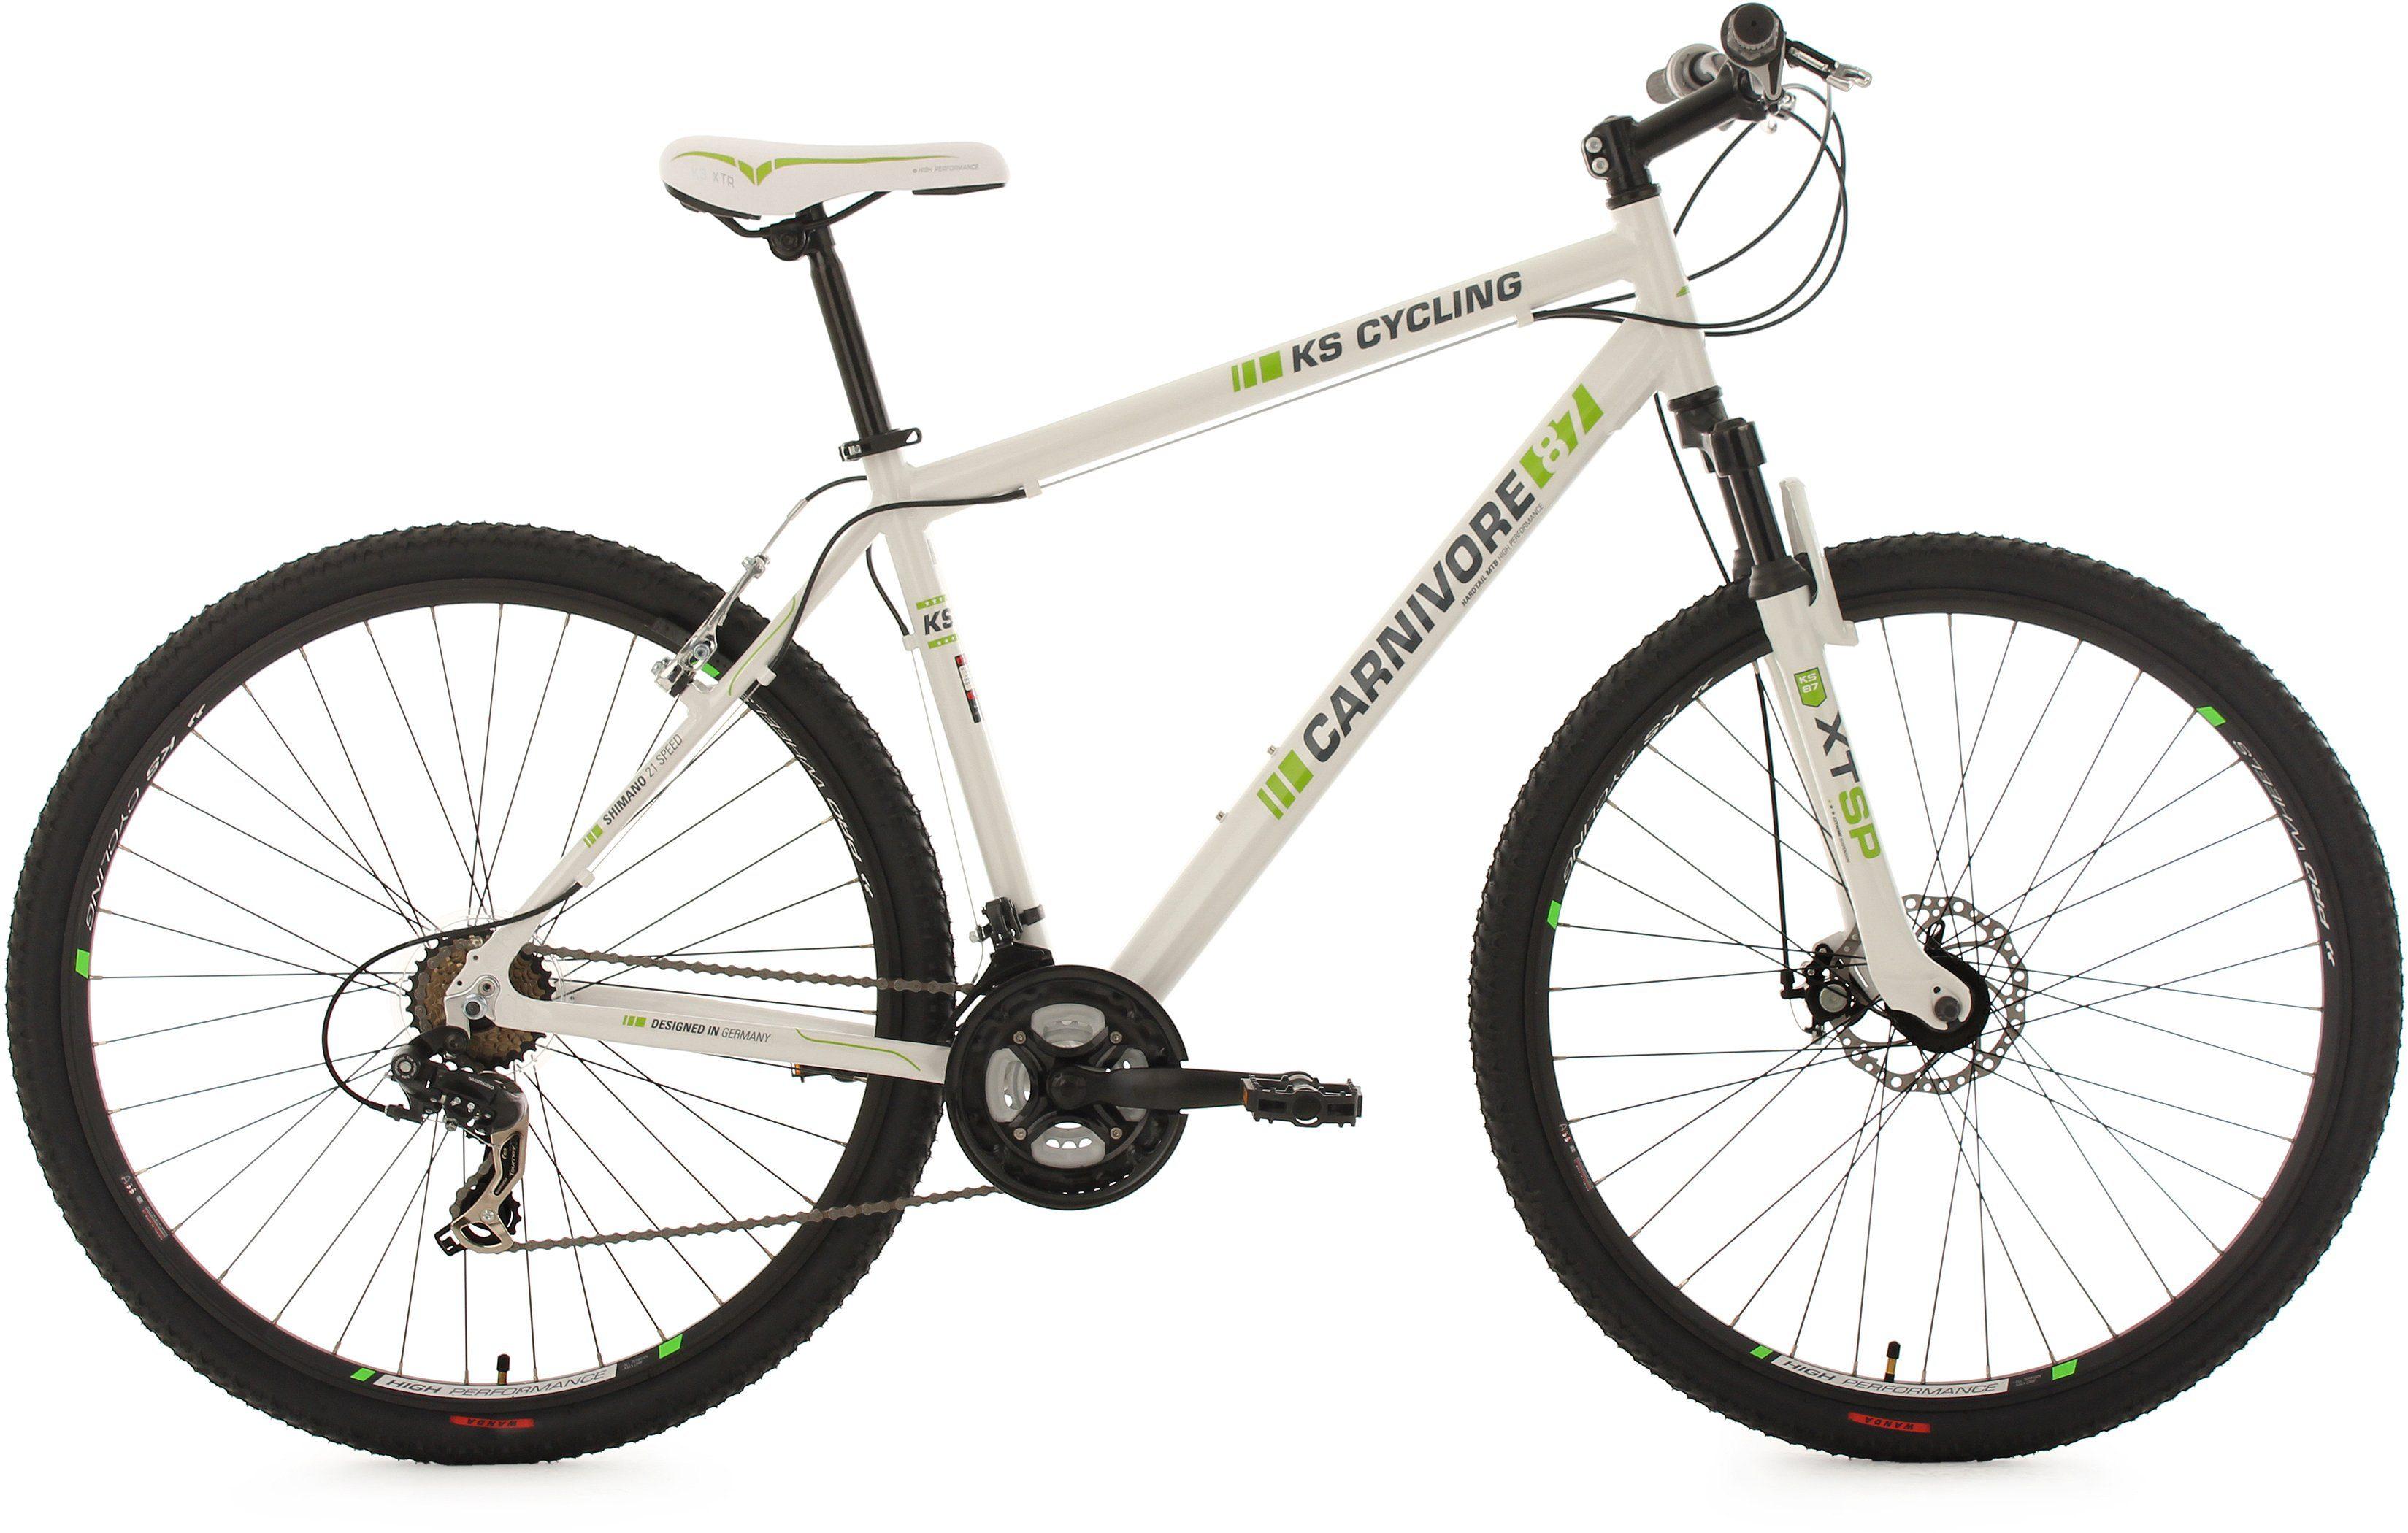 KS Cycling Hardtail-MTB, 29 Zoll, 21 Gang-Shimano Tourney Kettenschaltung, weiß-grün, »Carnivore«